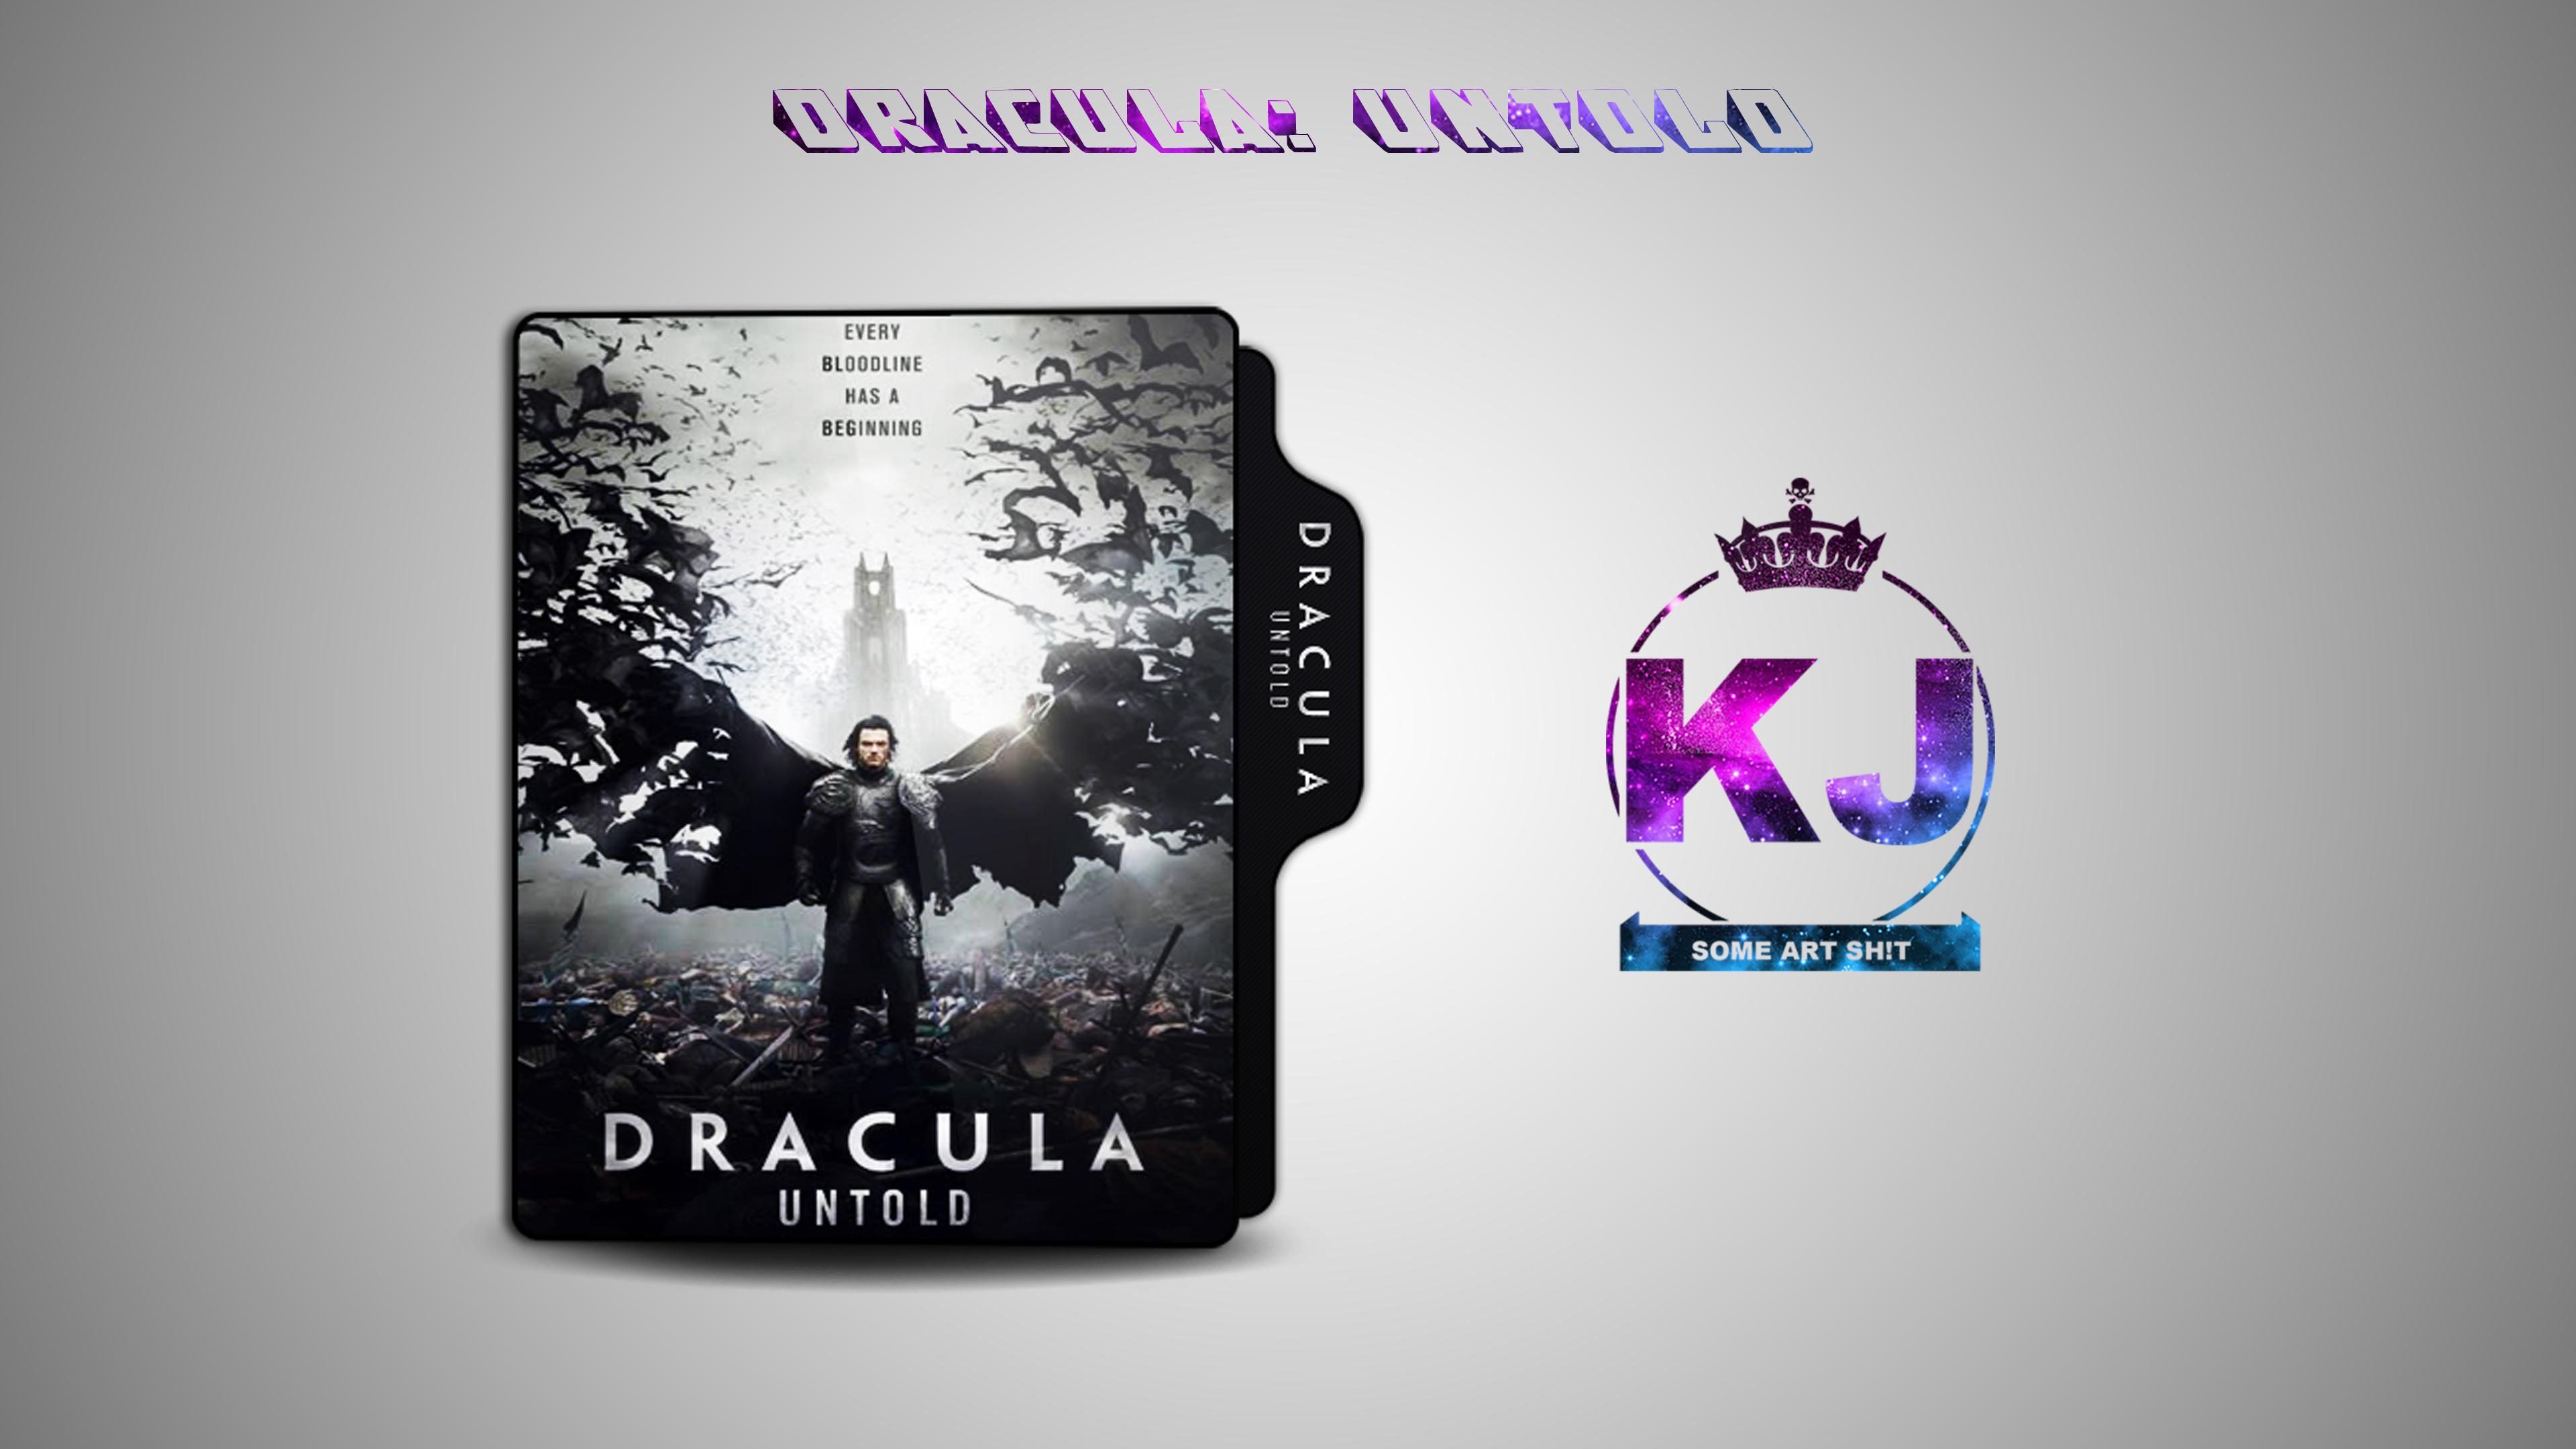 Dracula Untold 2014 Folder Icon By Kingjoe93 On Deviantart